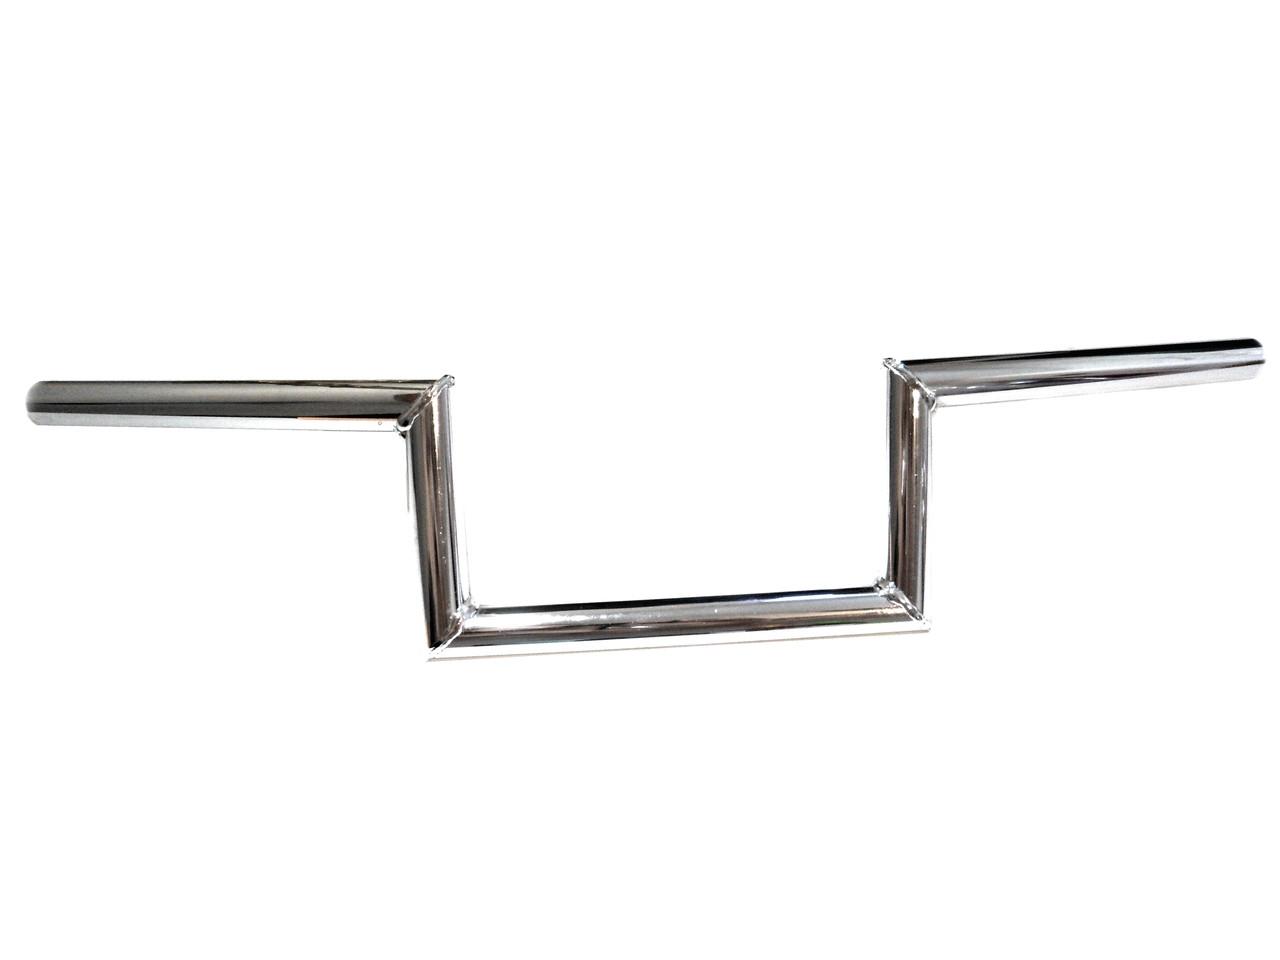 Universal Chrome Moped Handlebars - ZZ Top Bars